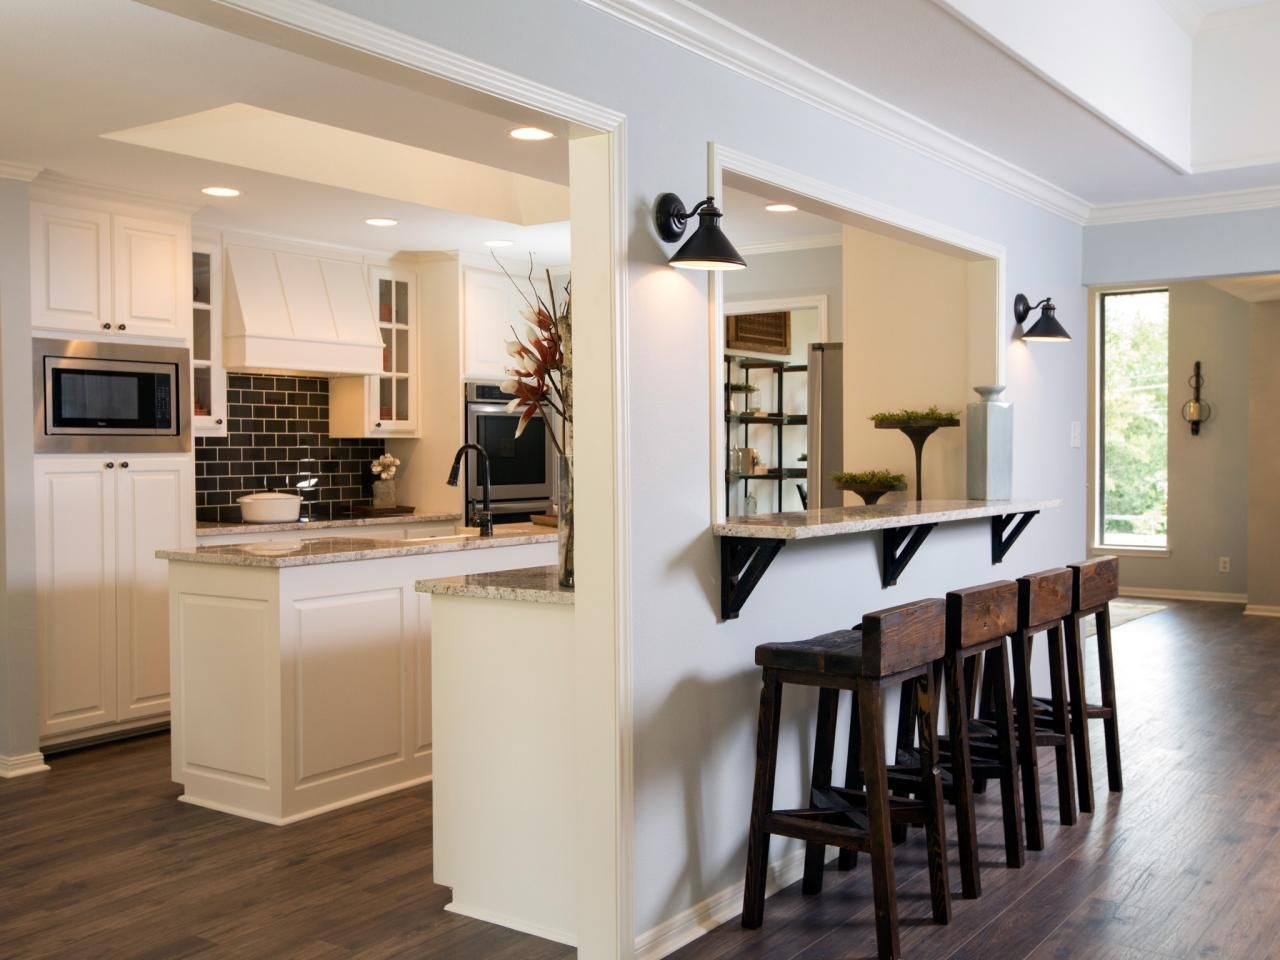 Ideas, kitchen breakfast bar stools australia countertop materials for pertaining to measurements 1280 x 960  .